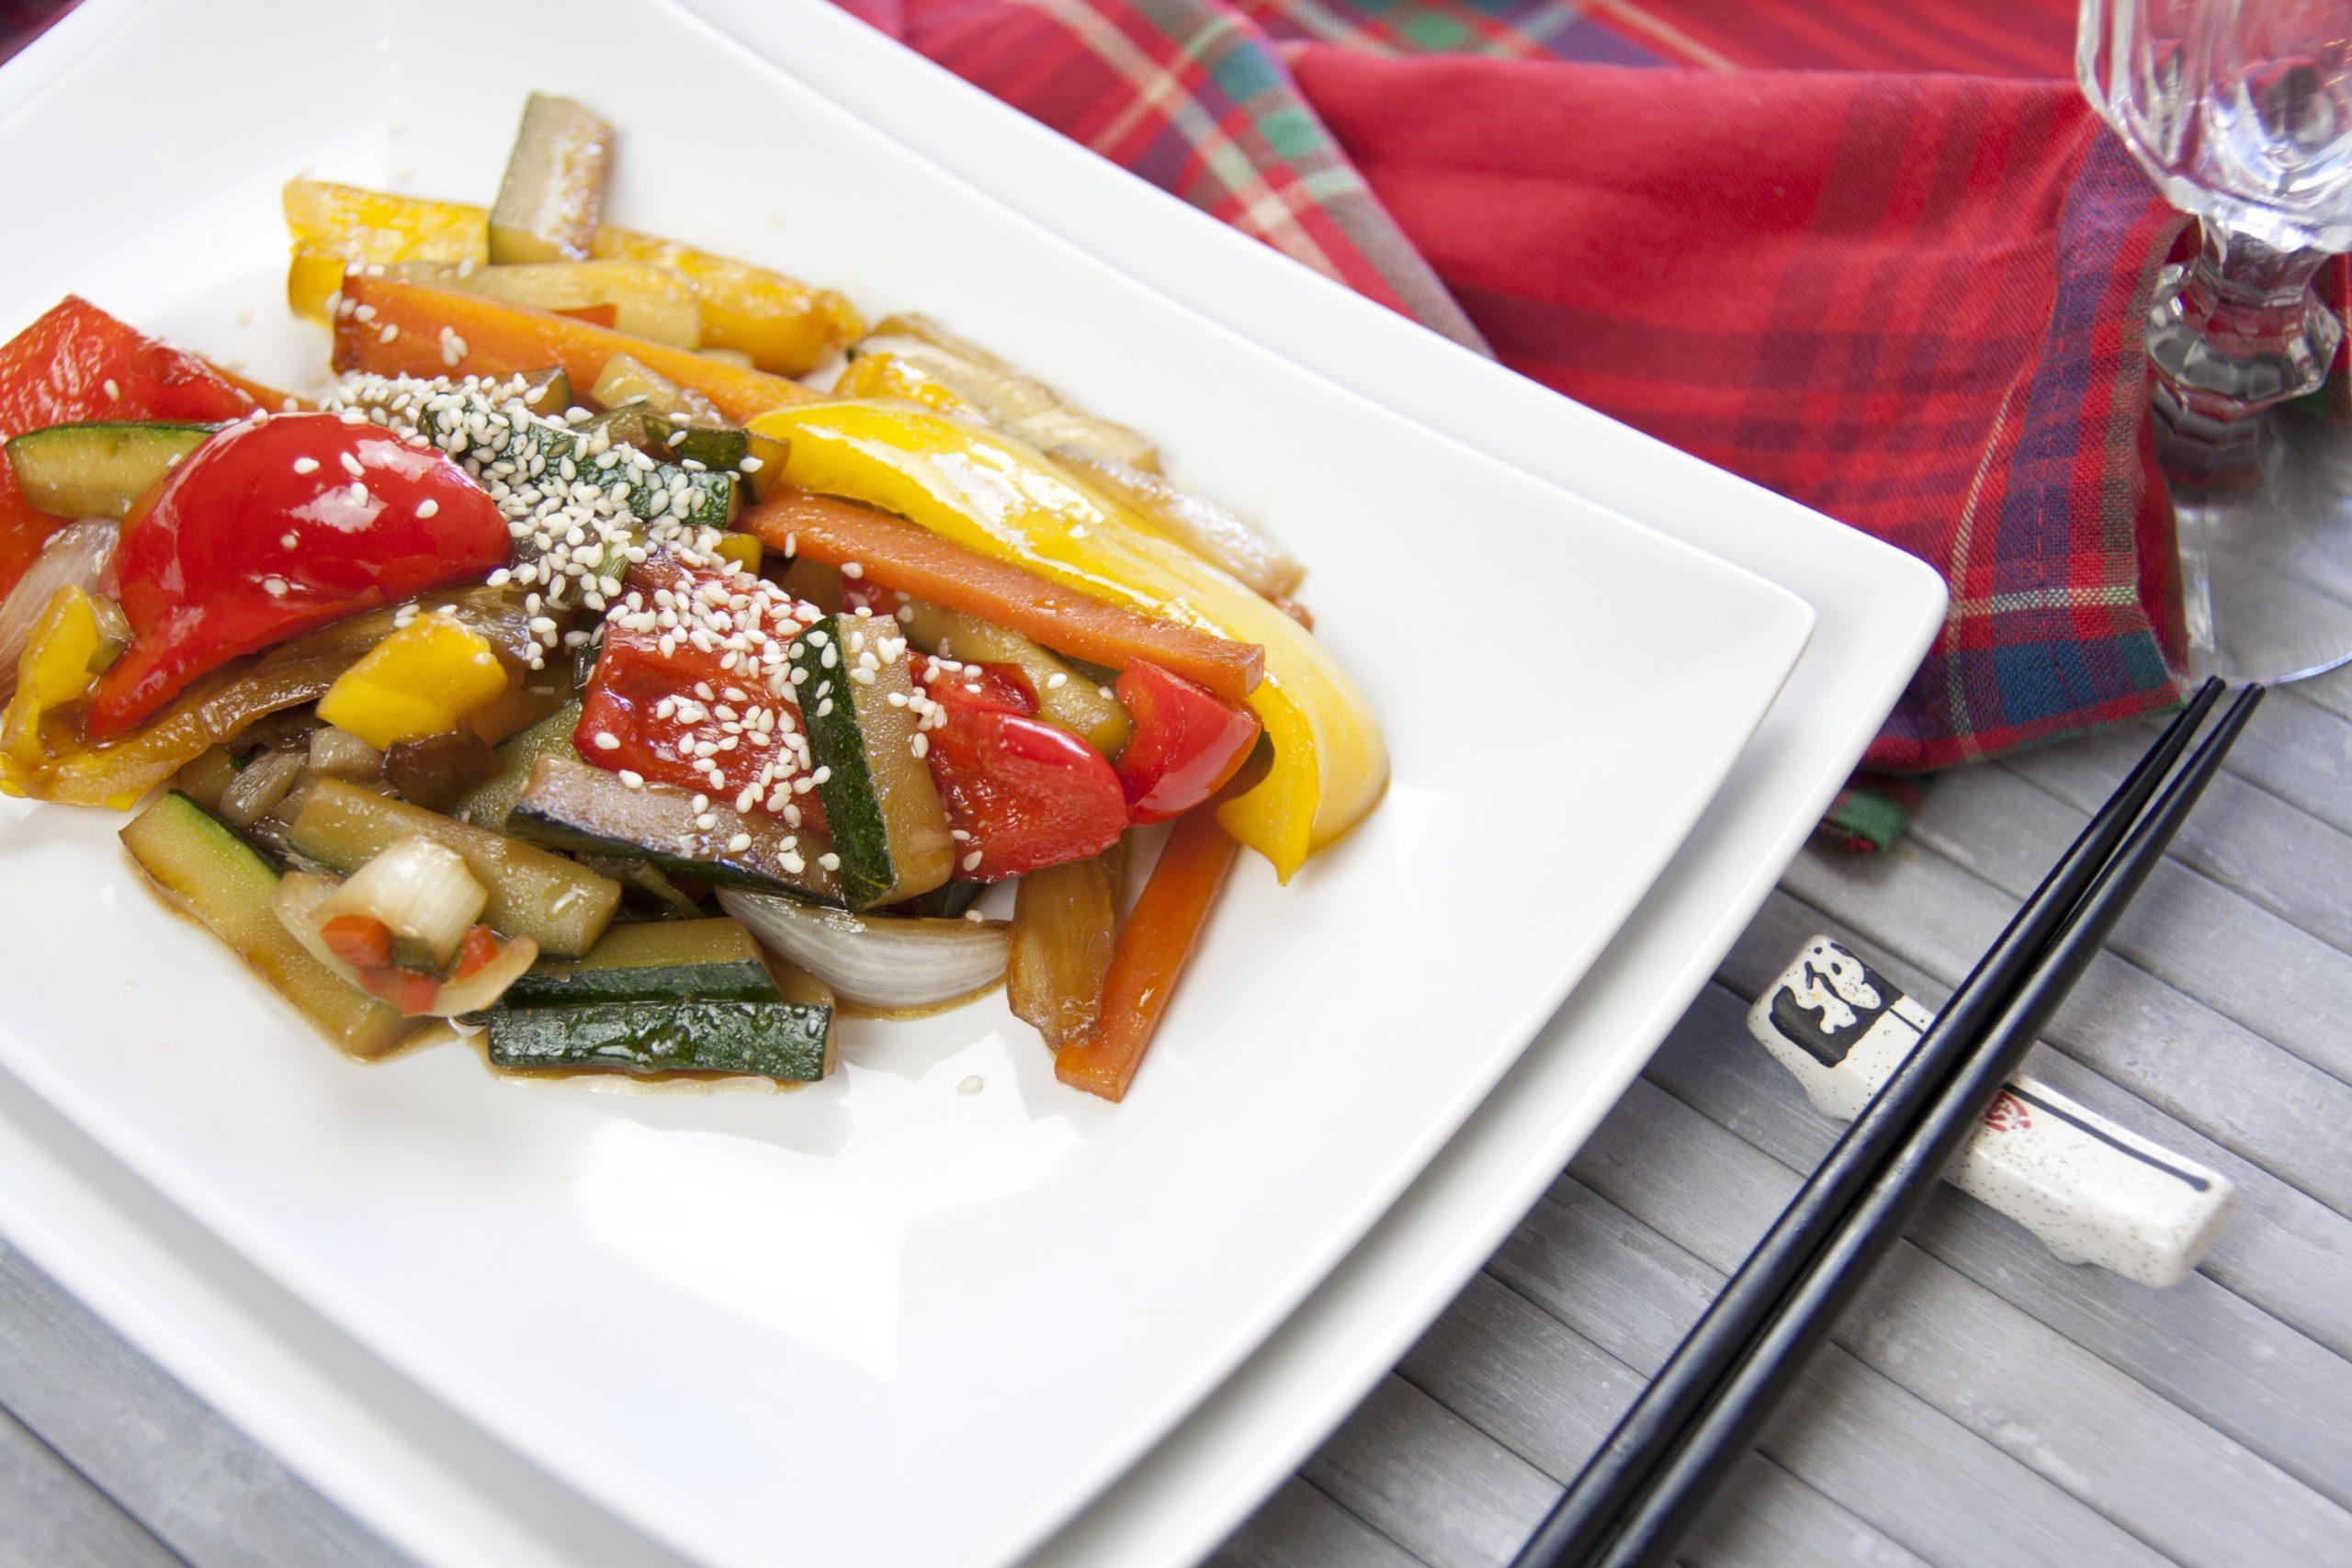 Verdure saltate nel wok alla cinese